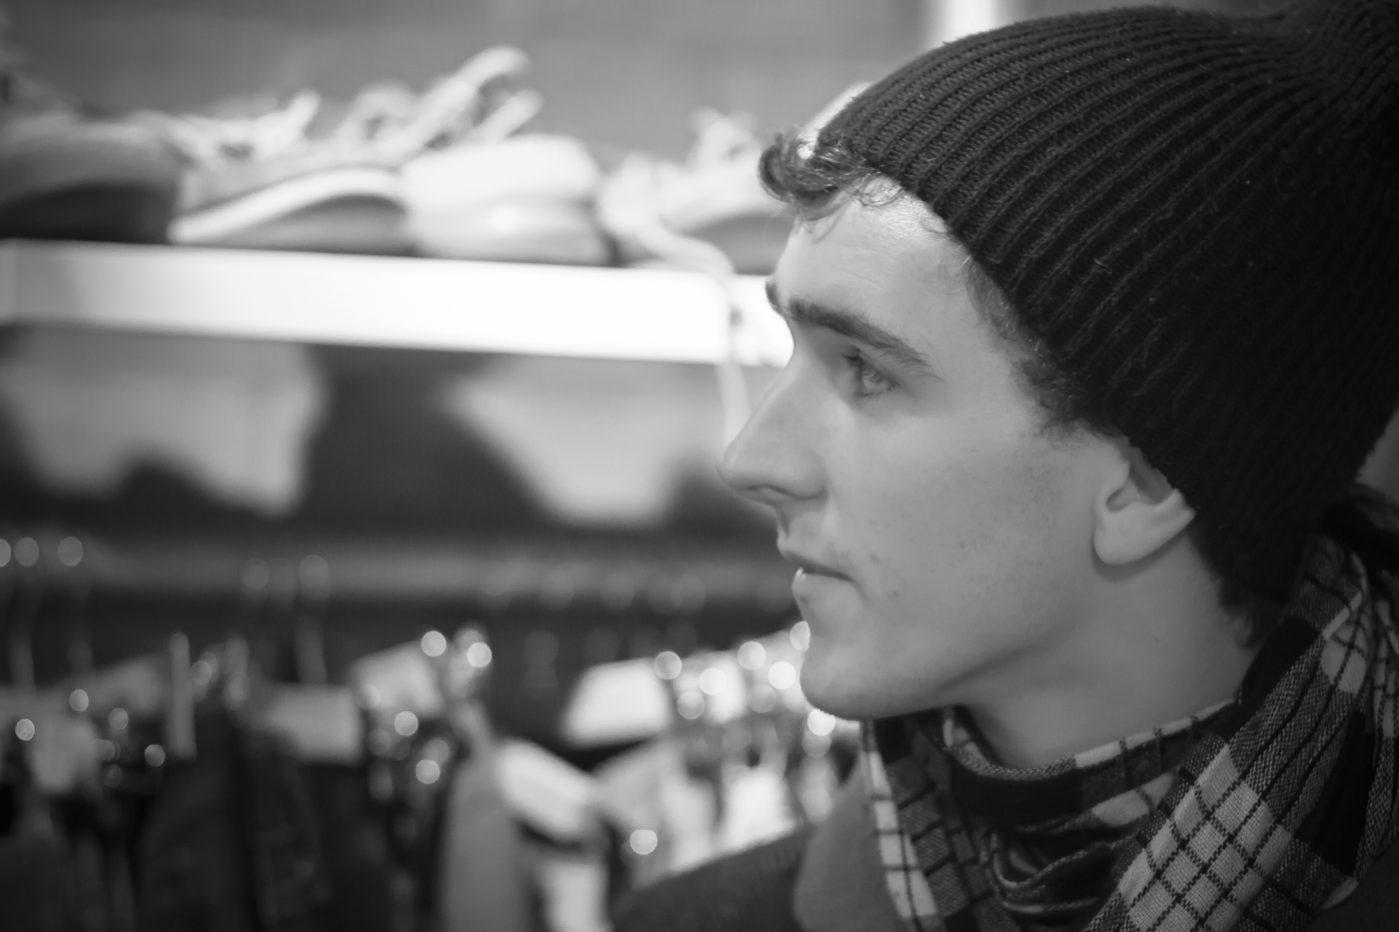 Solo artist in black and white.